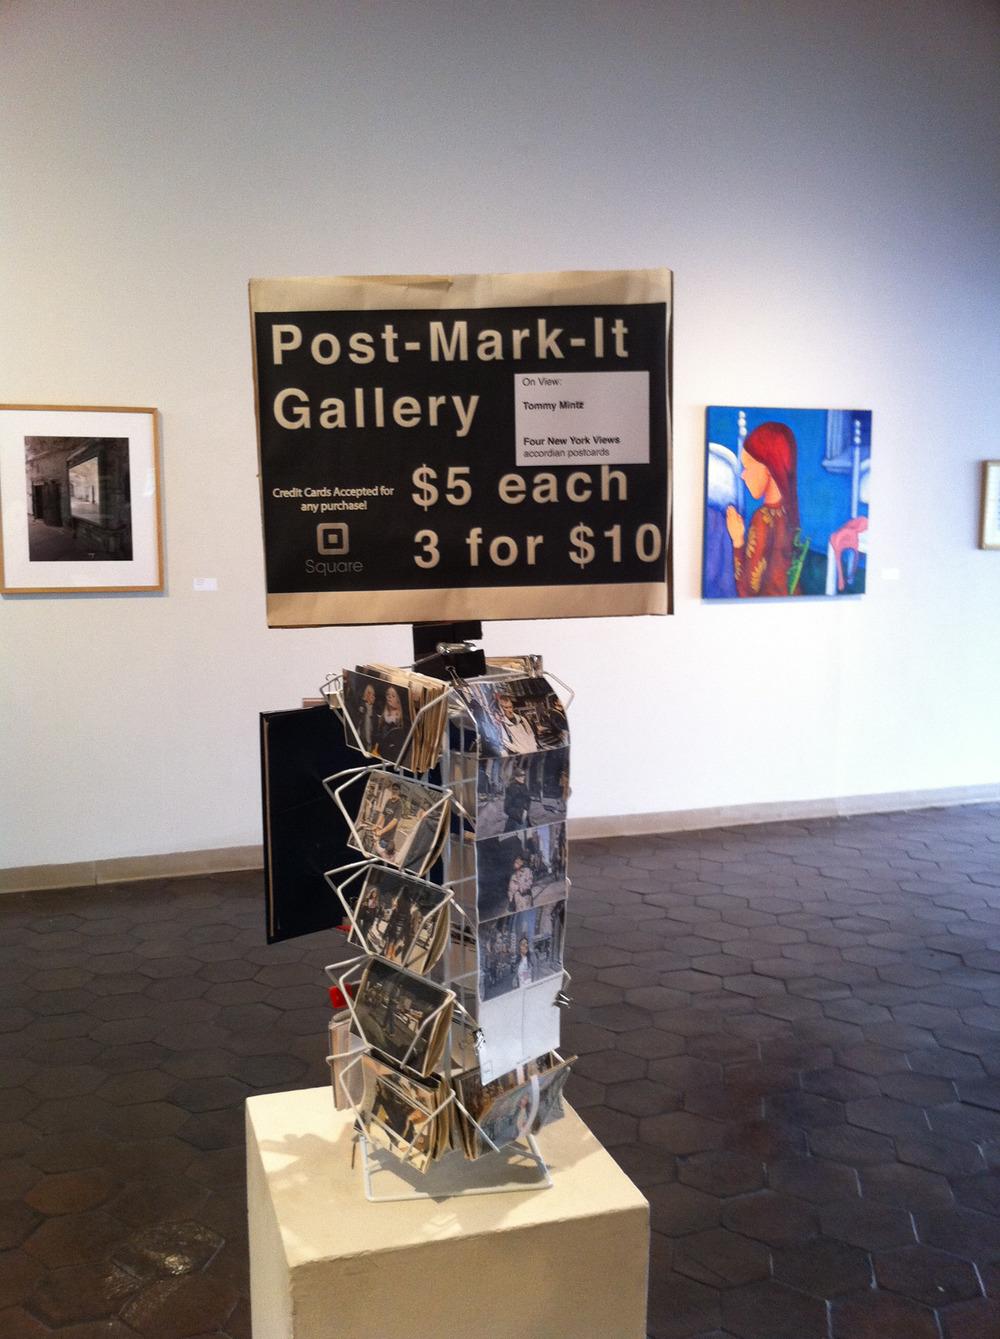 Post-Mark-It gallery at Kingsborough IMG_7842.jpg